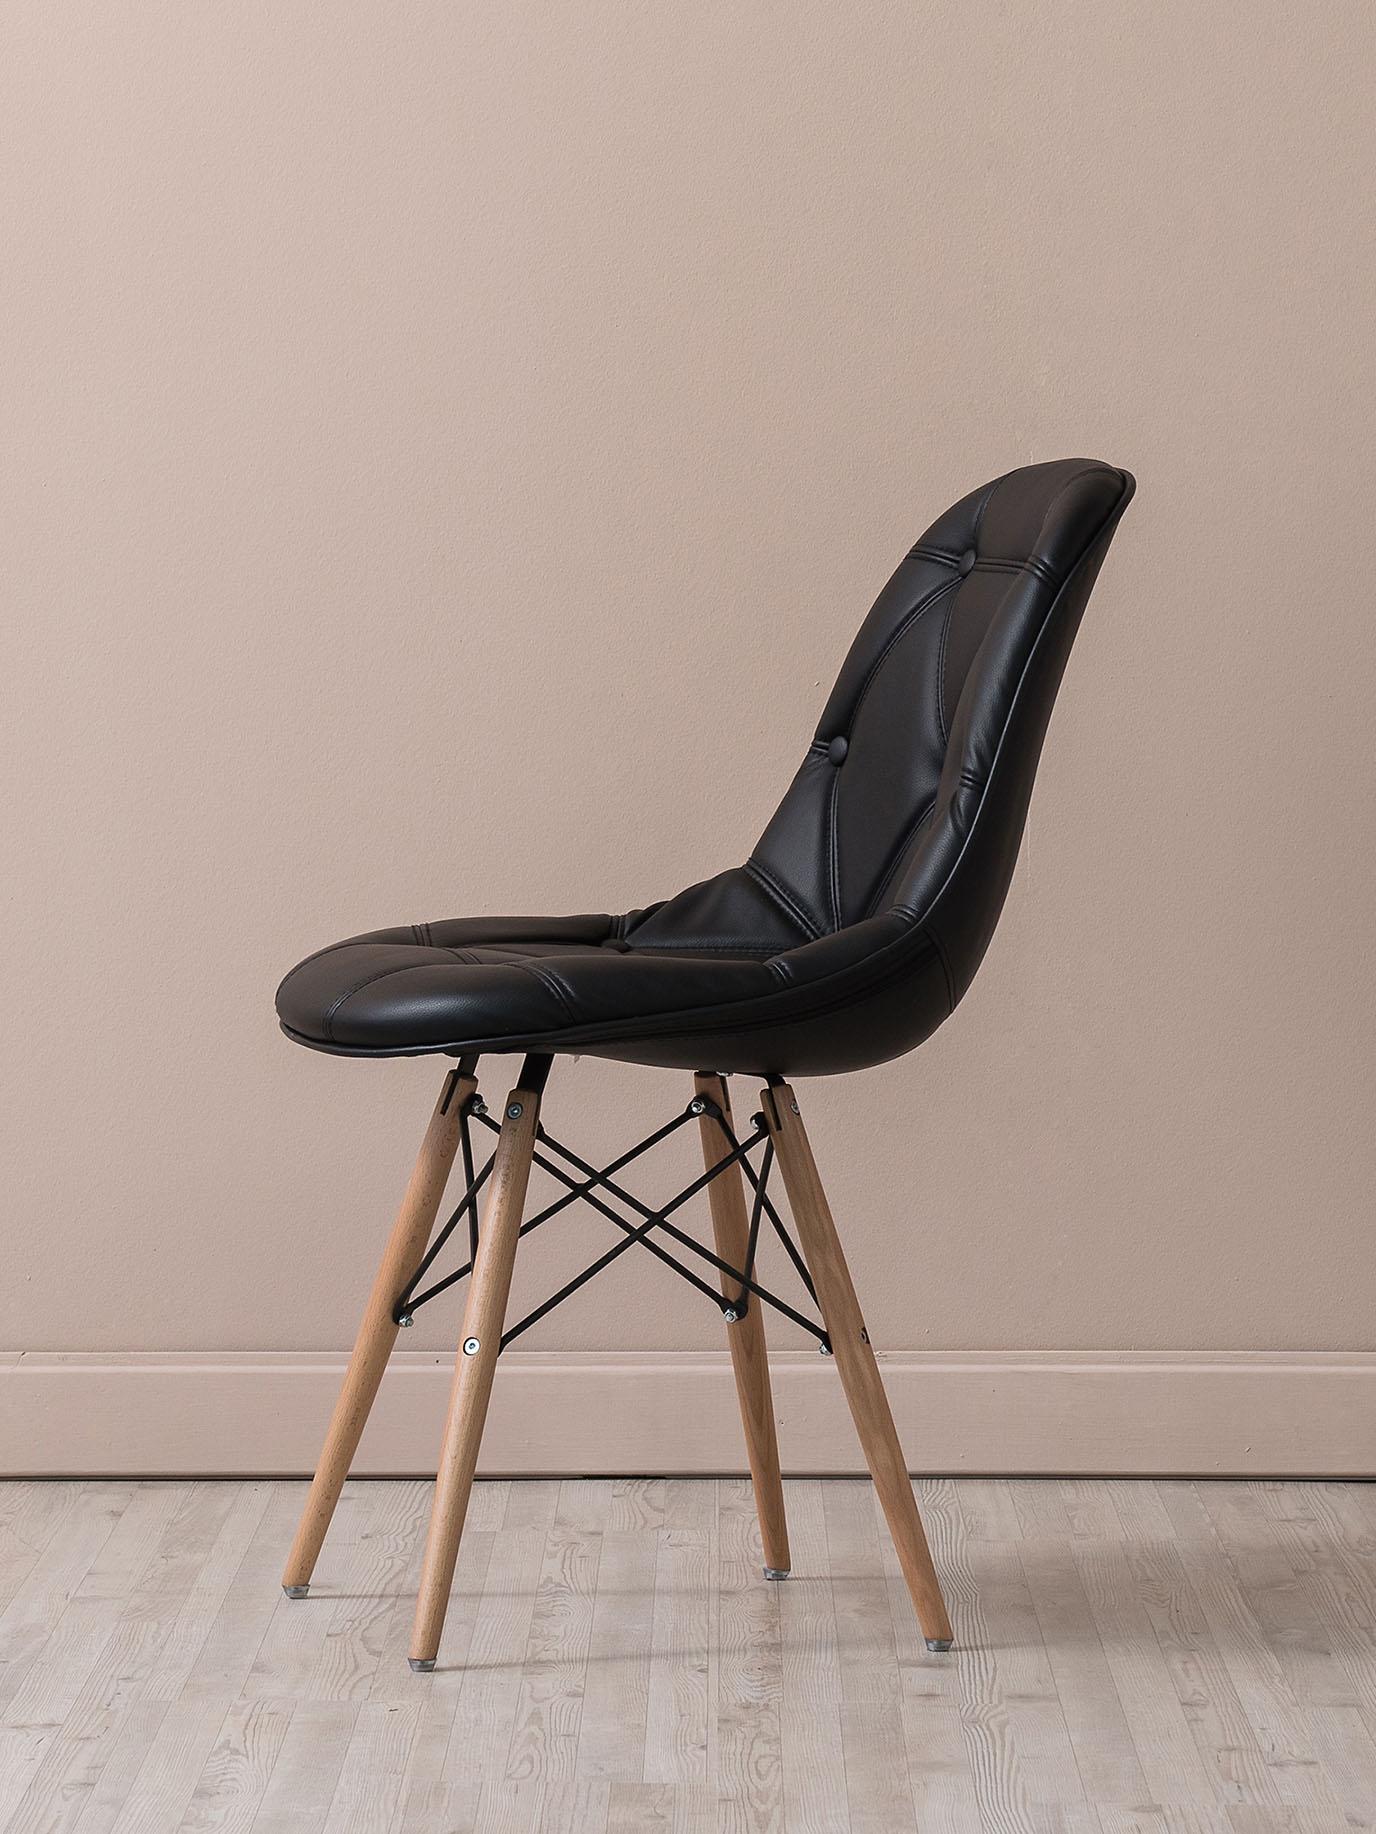 one-profile-chair-1.jpg